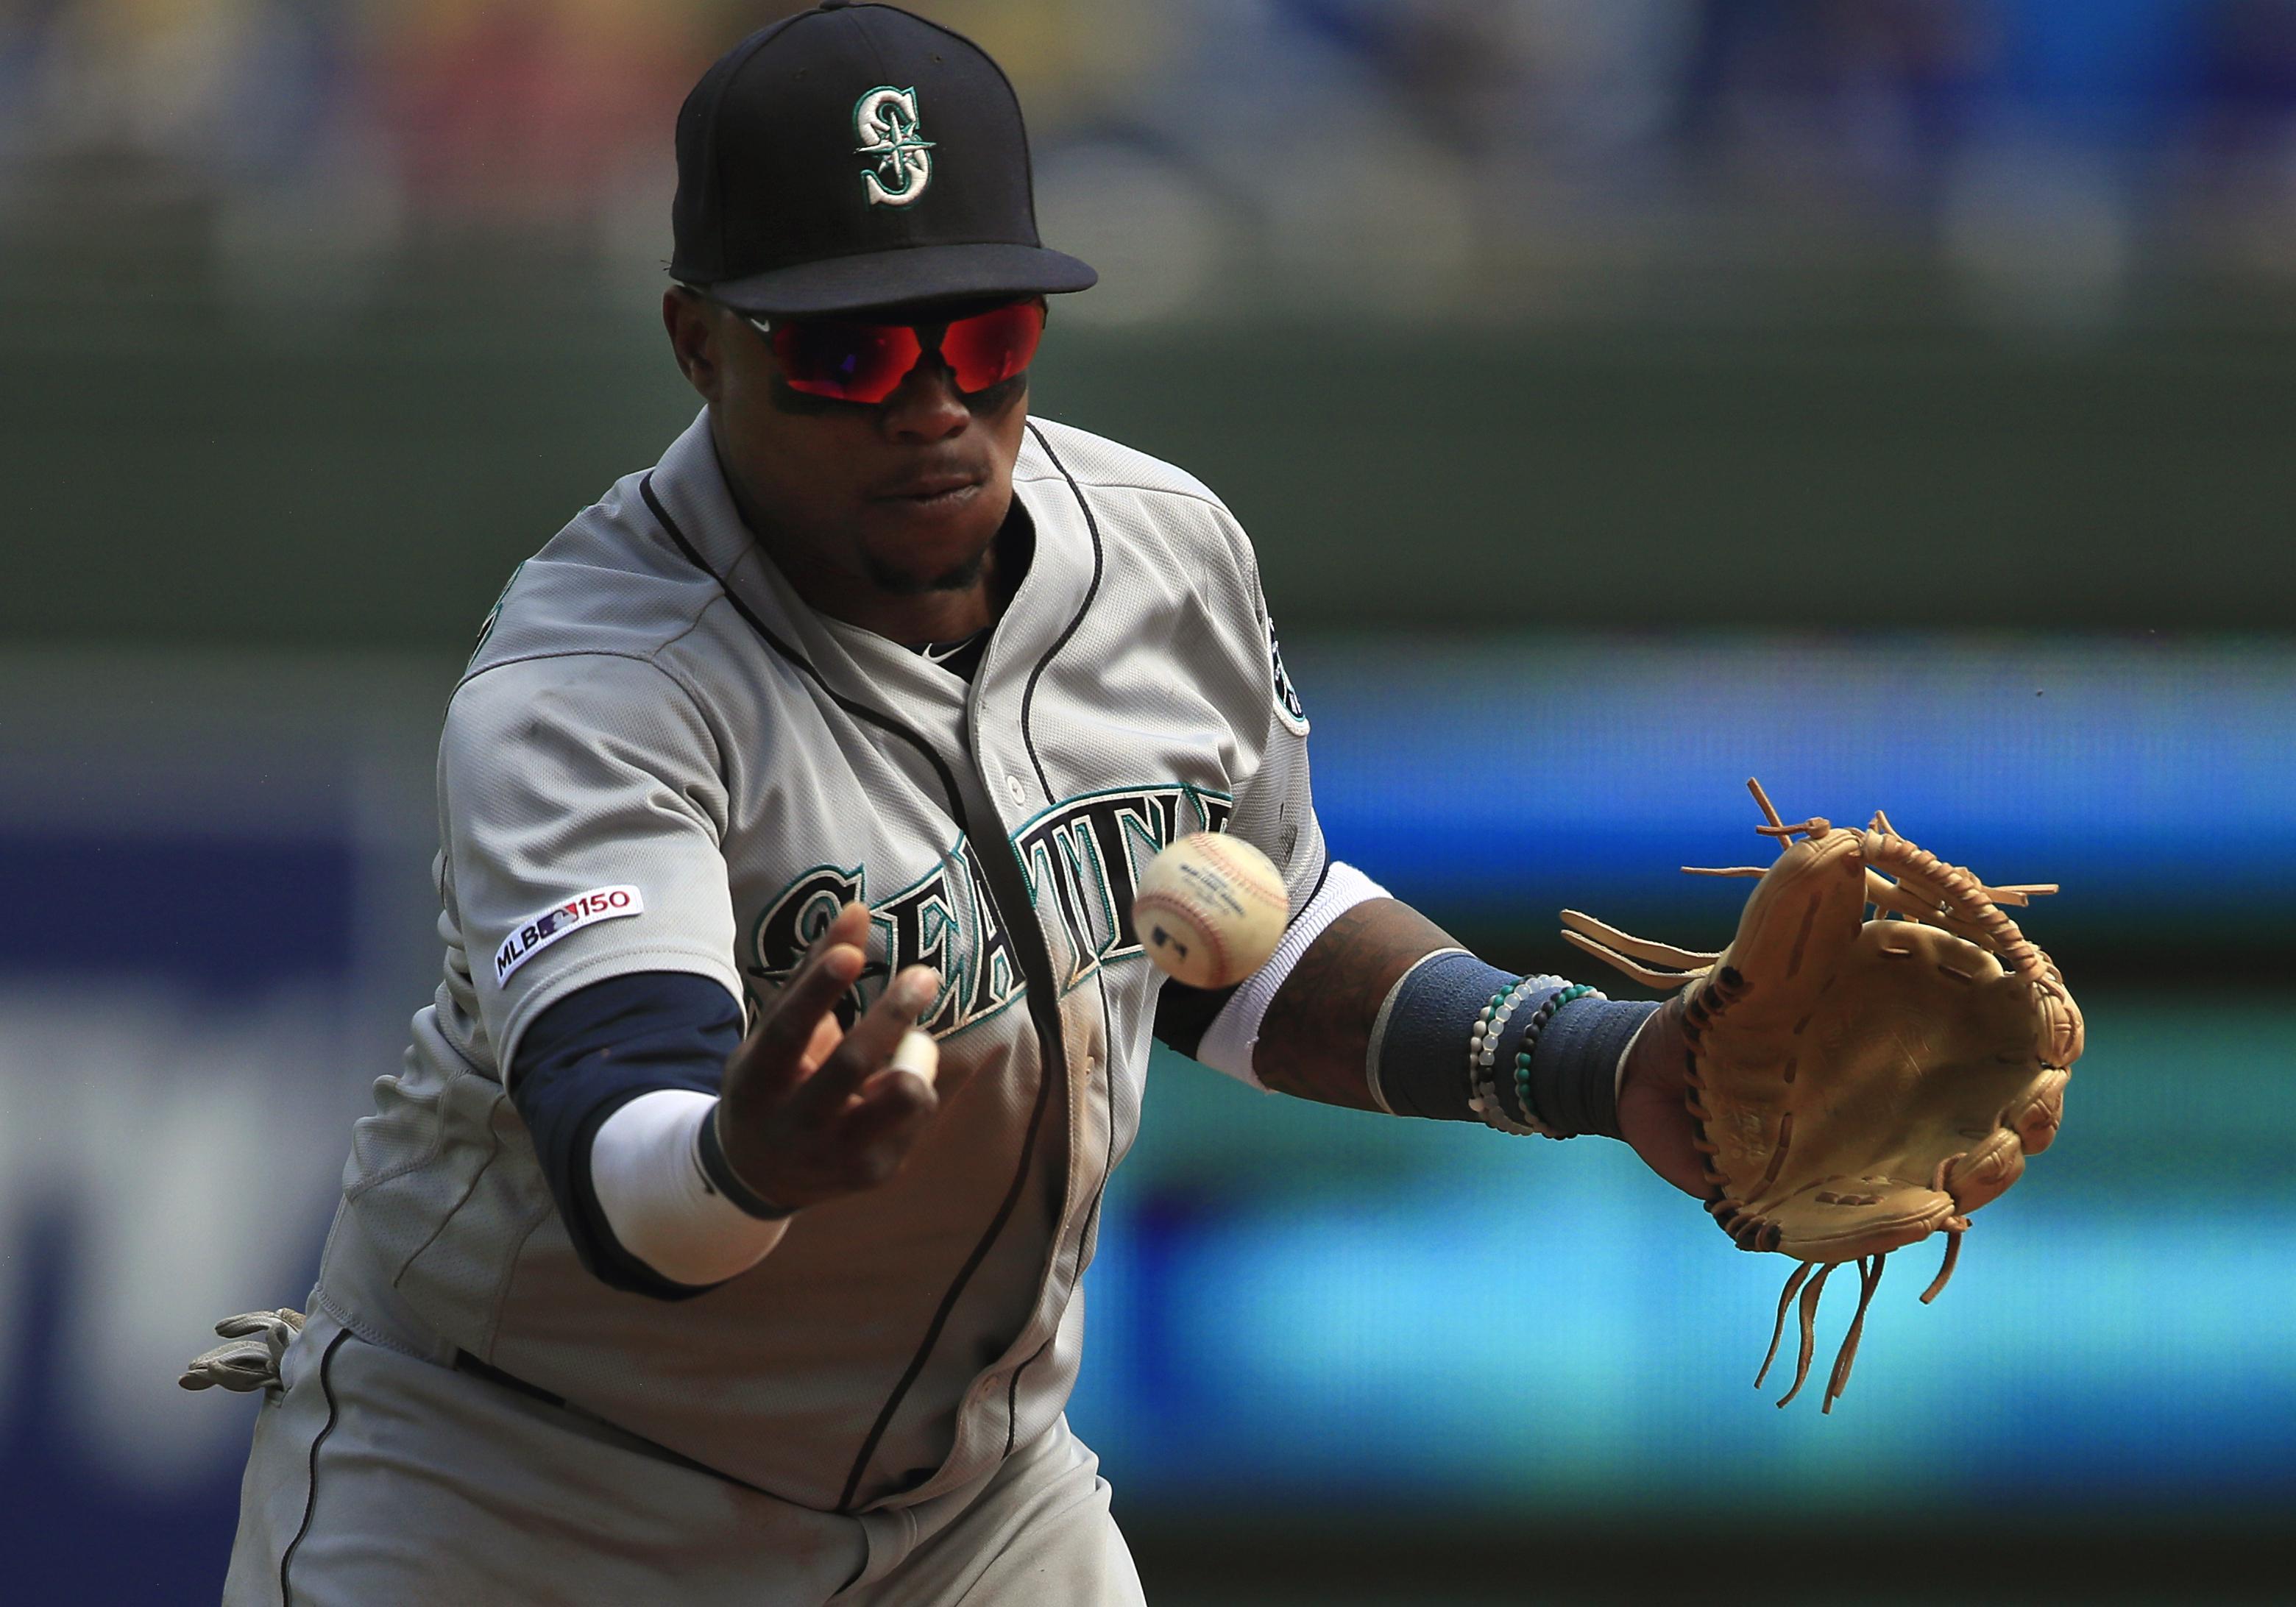 055bb229636 Seattle Mariners shortstop Tim Beckham bobbles a ball hit by Kansas City  Royals designated hitter Jorge